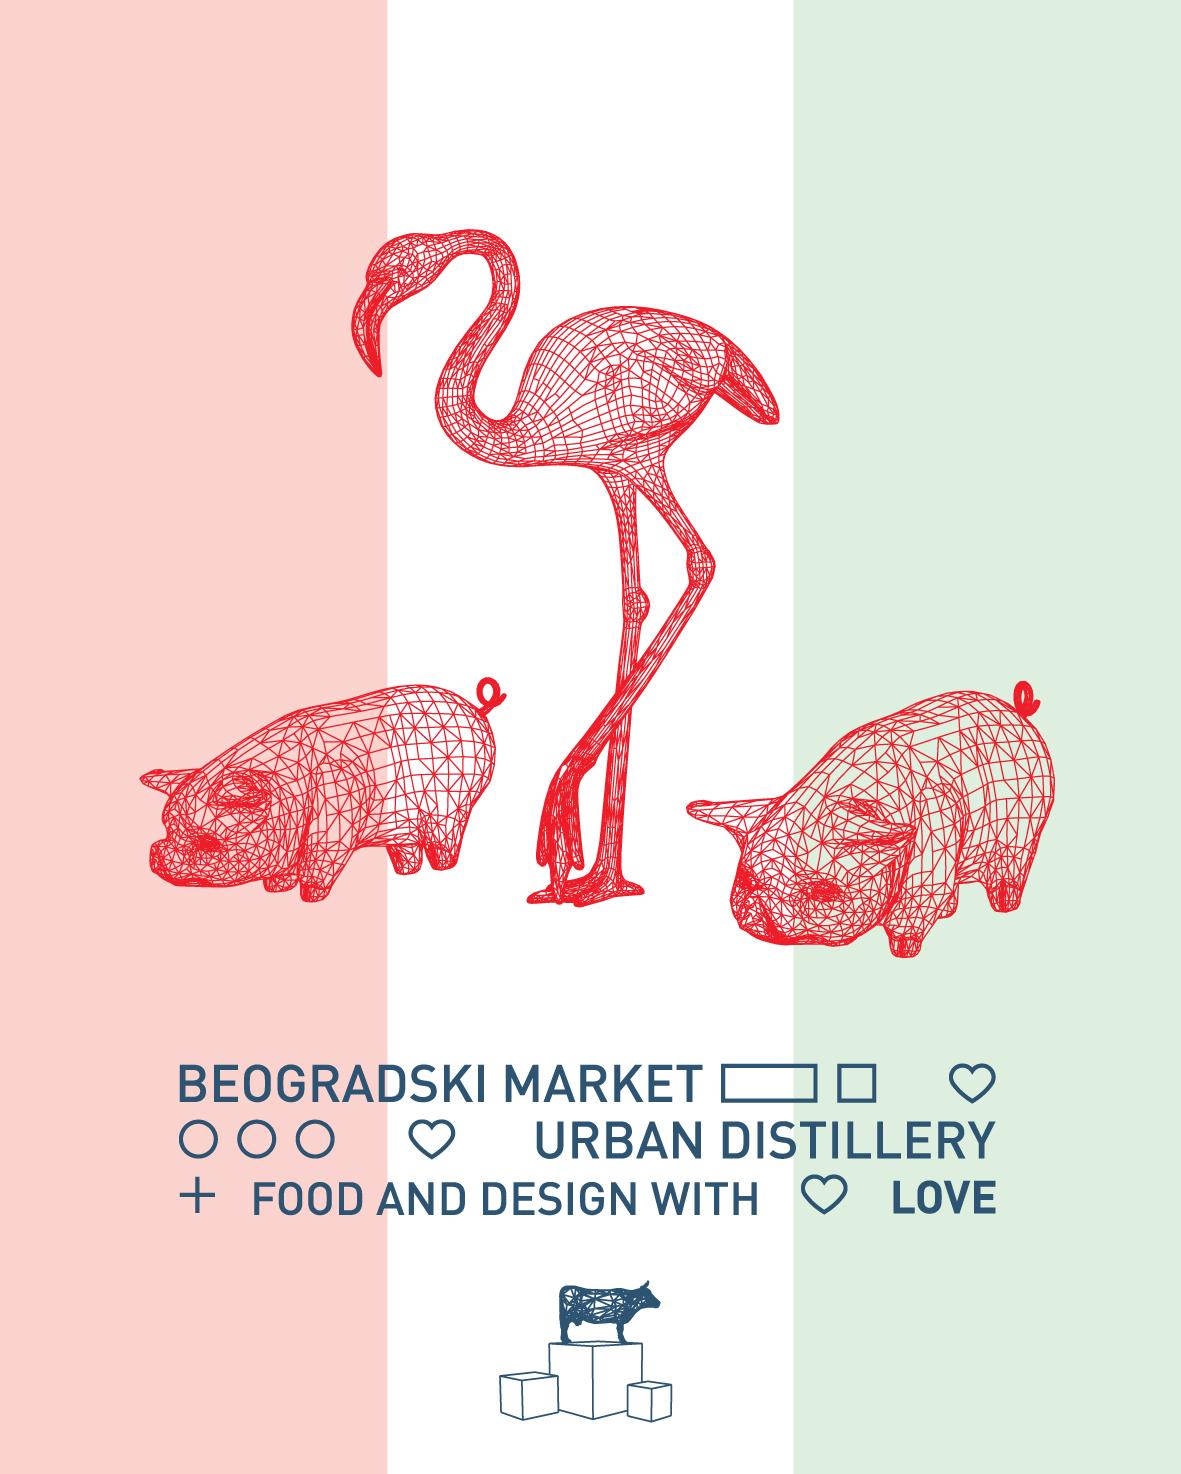 Beogradski Market